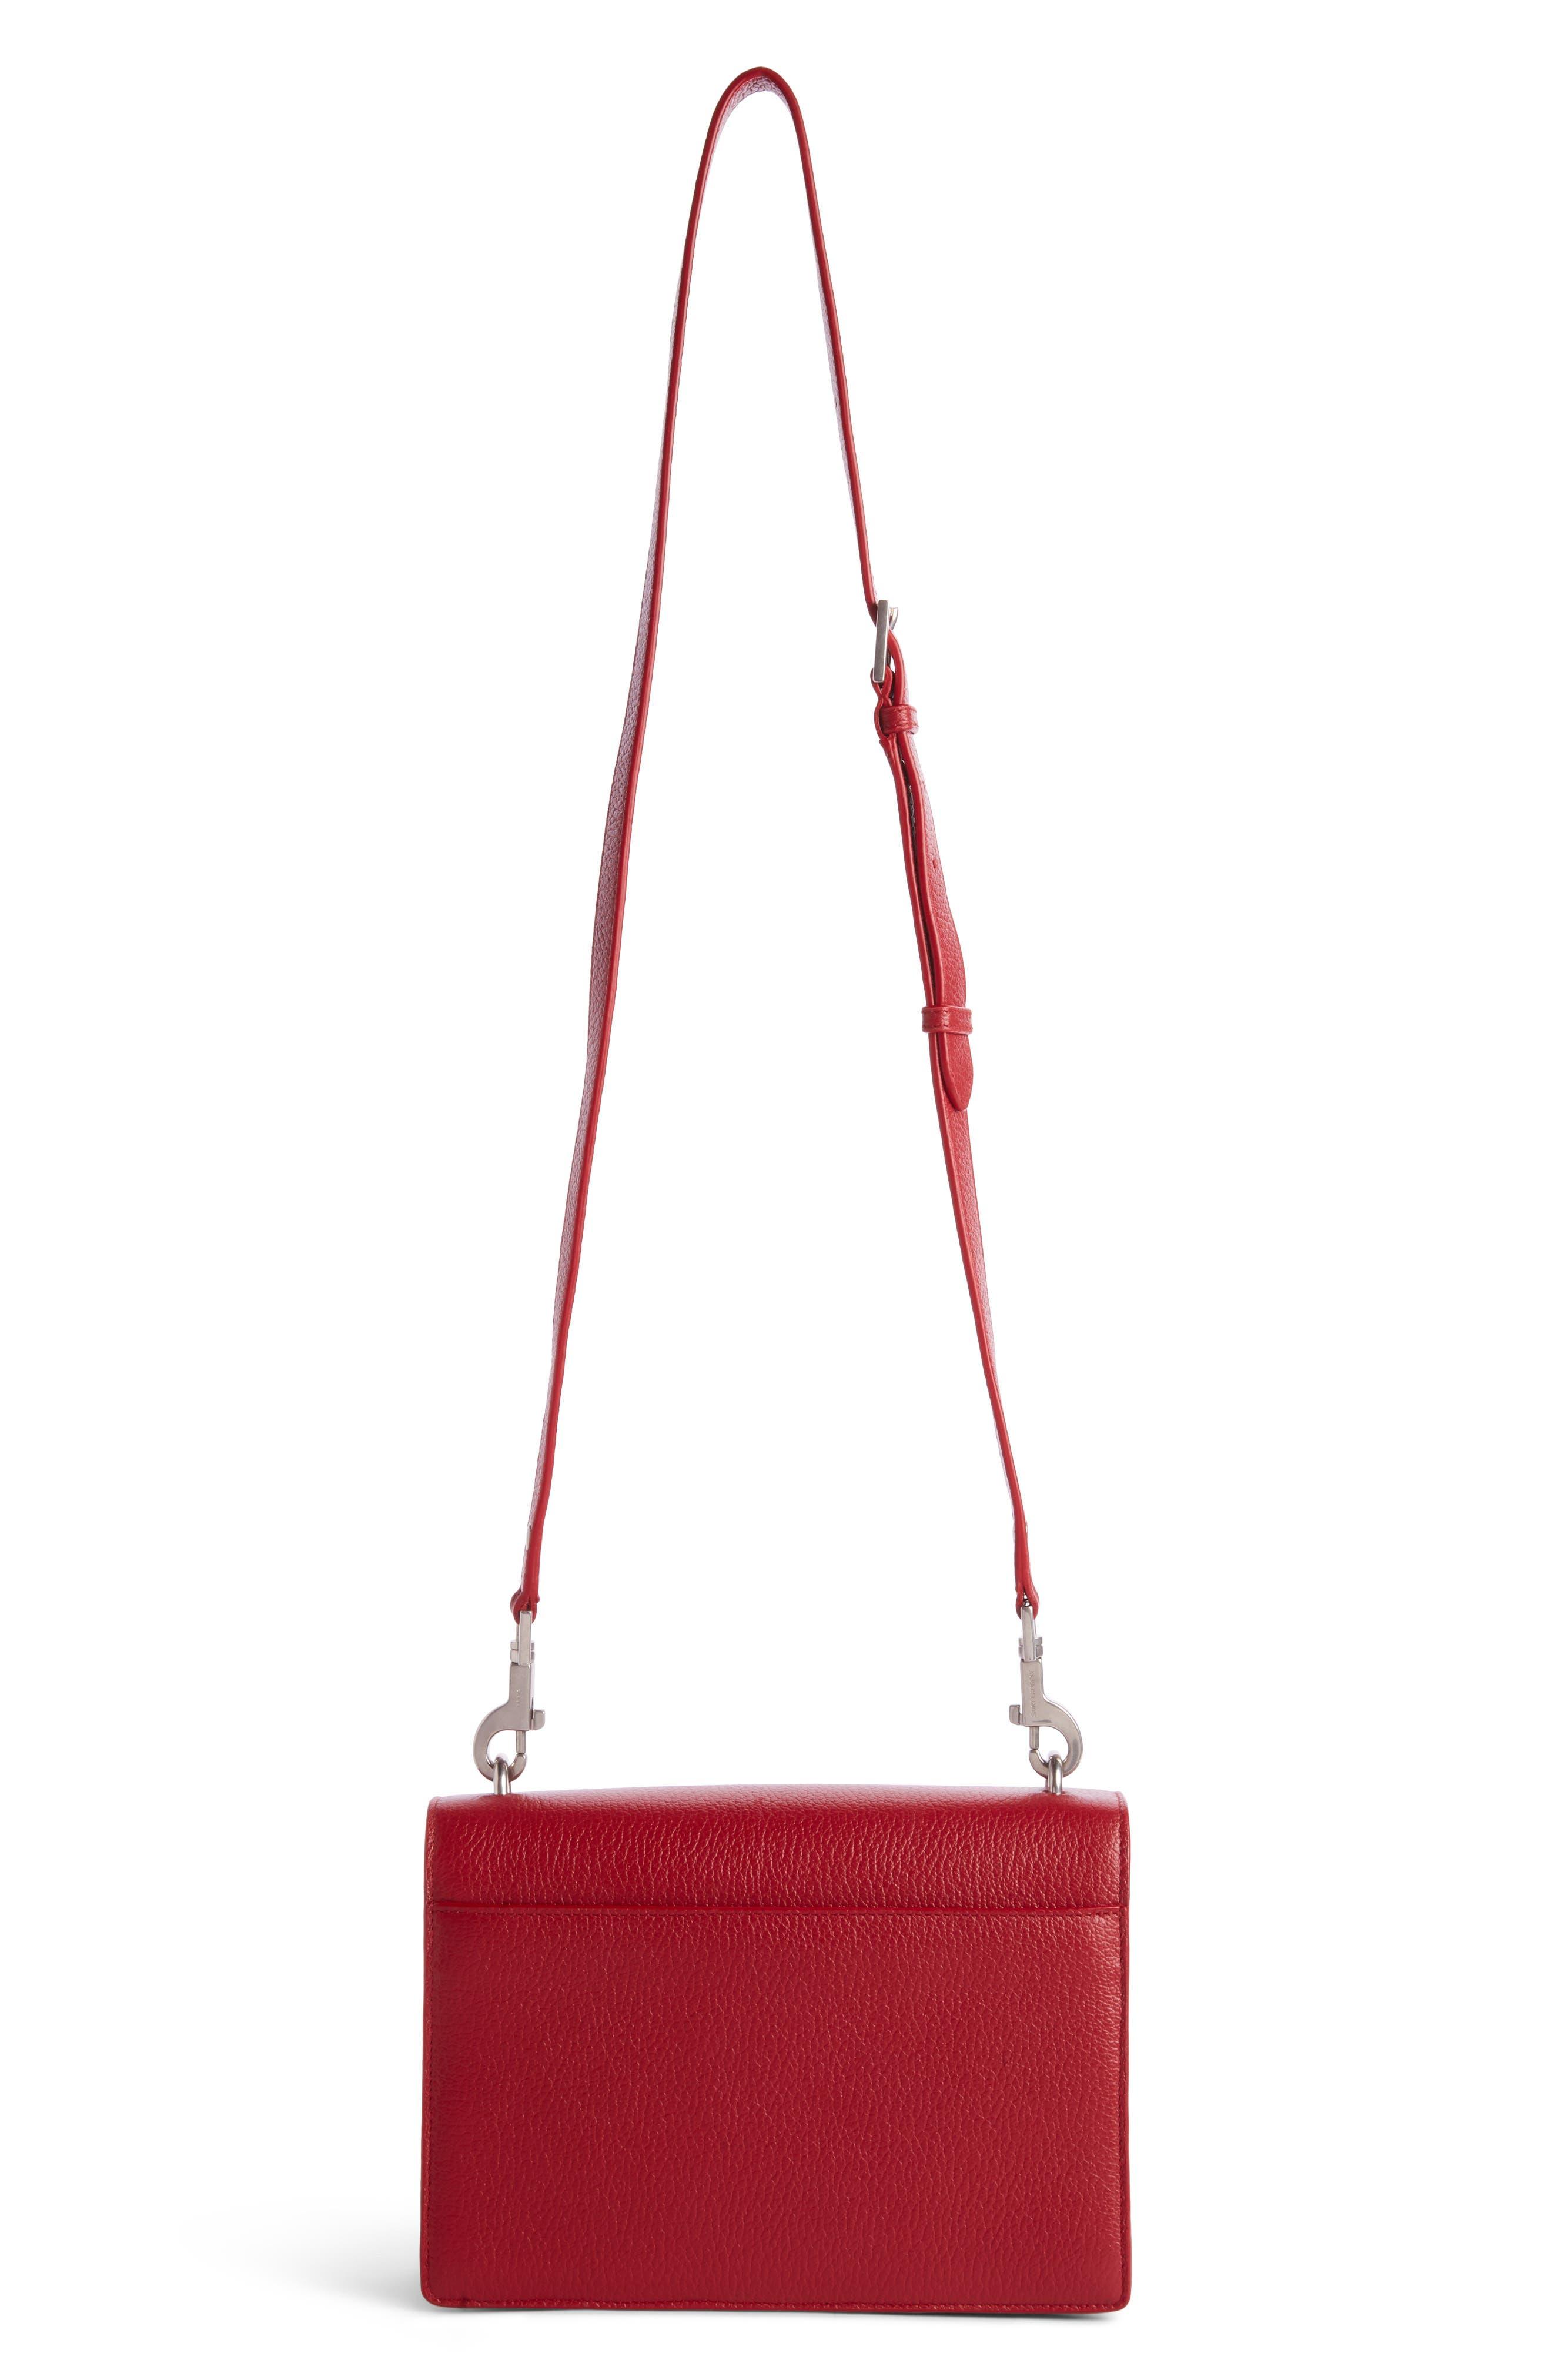 Medium Sunset Grained Leather Shoulder Bag,                             Alternate thumbnail 2, color,                             600